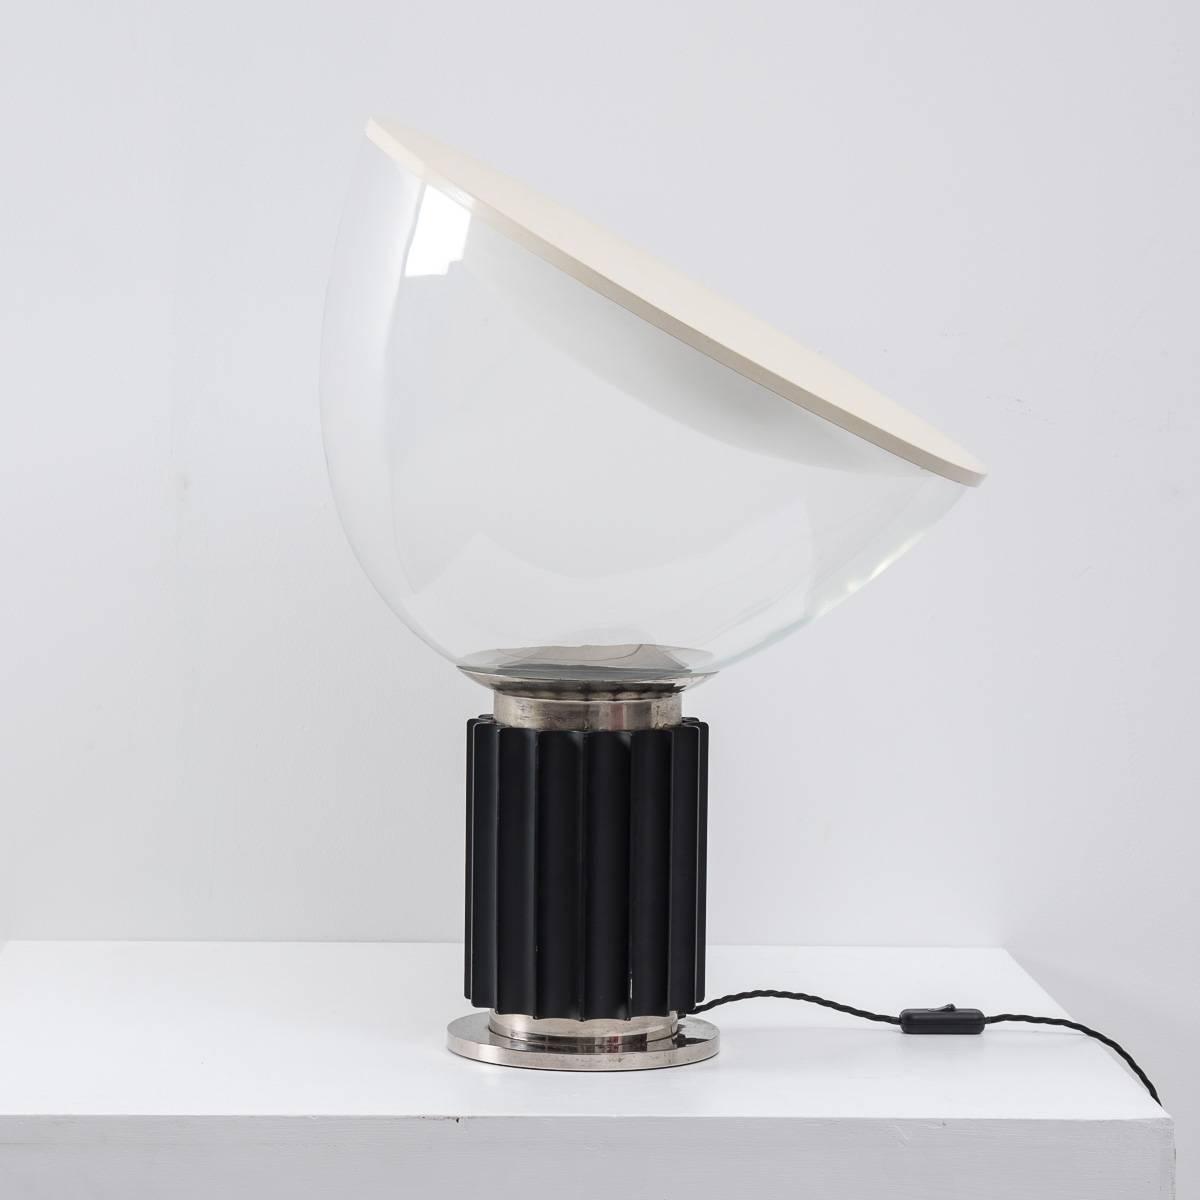 Achille castiglioni taccia table lamp italy 1962 at 1stdibs aloadofball Images